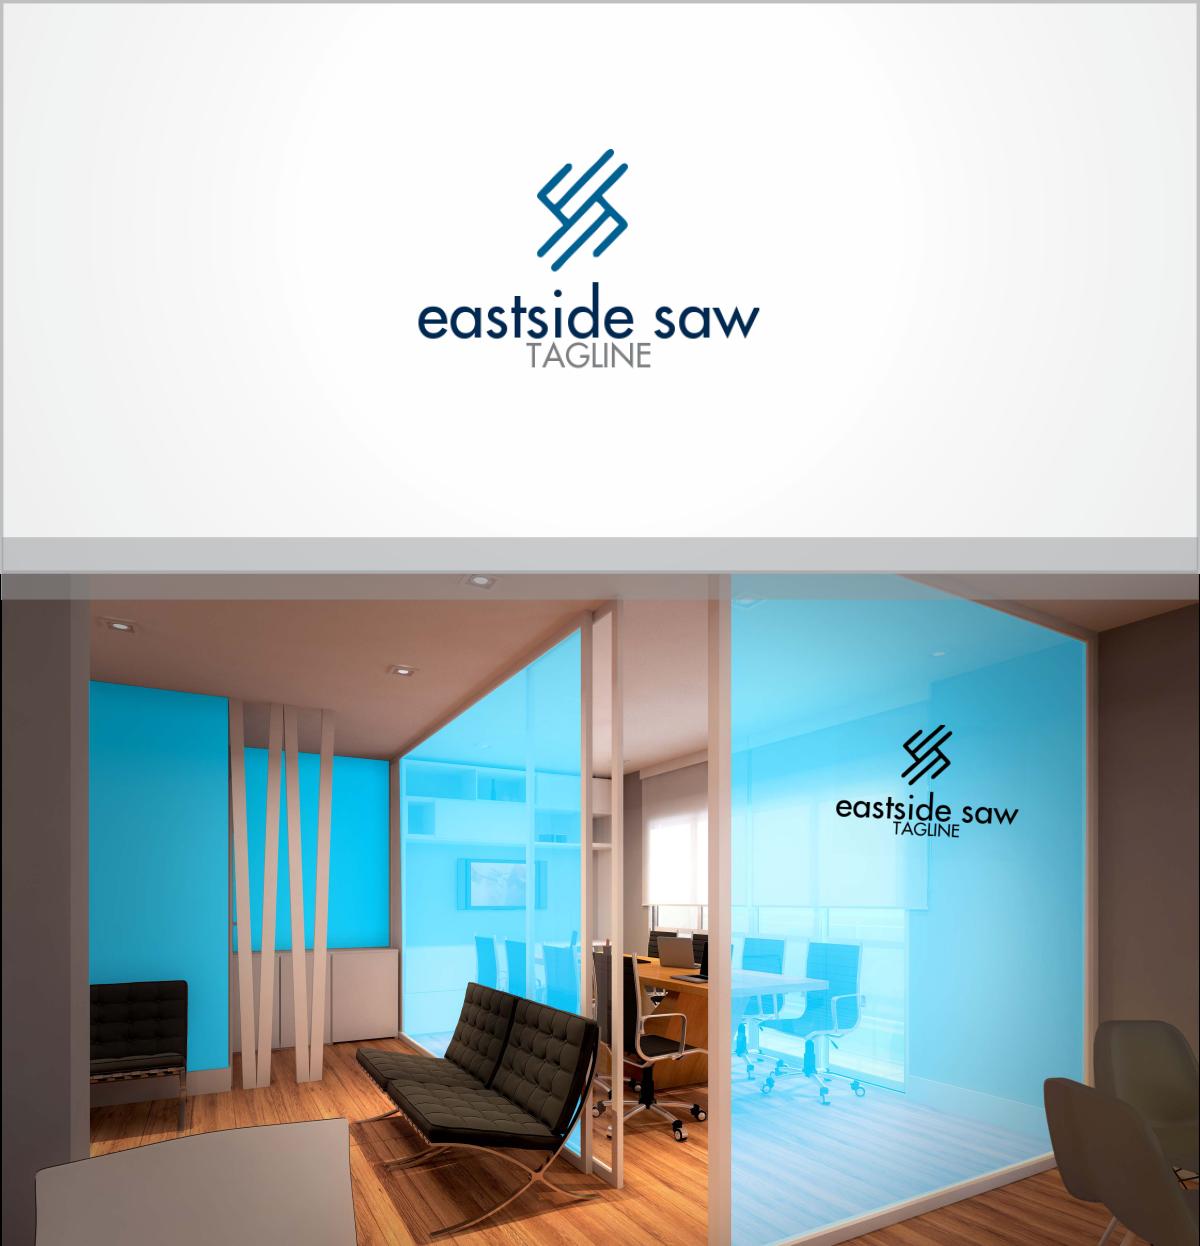 Professional, Bold, Manufacturing Logo Design for eastside saw ...